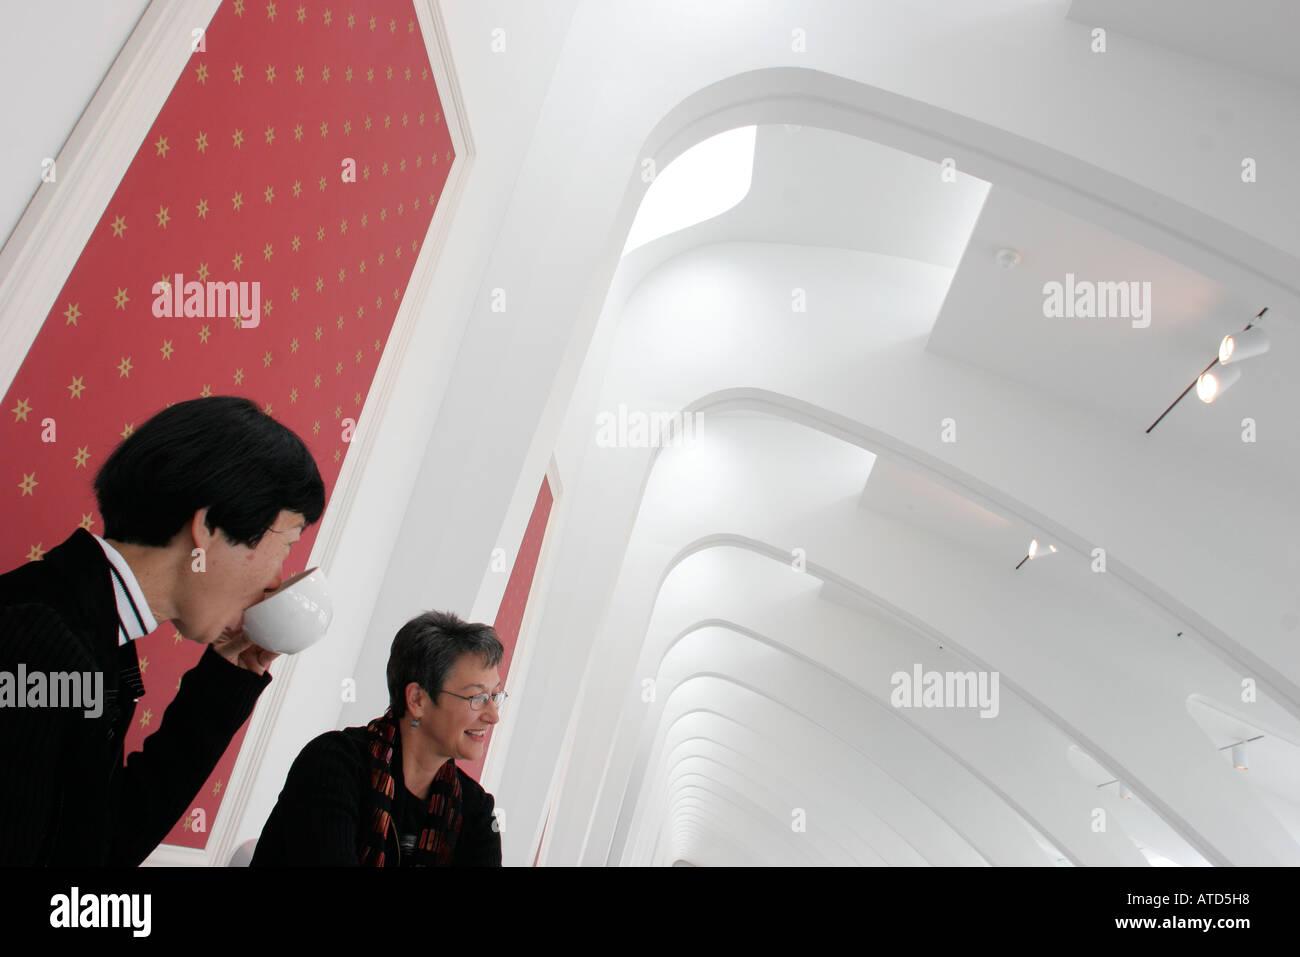 Wisconsin Milwaukee Milwaukee Art Museum Quadracci Pavilion Asian woman cup coffee - Stock Image